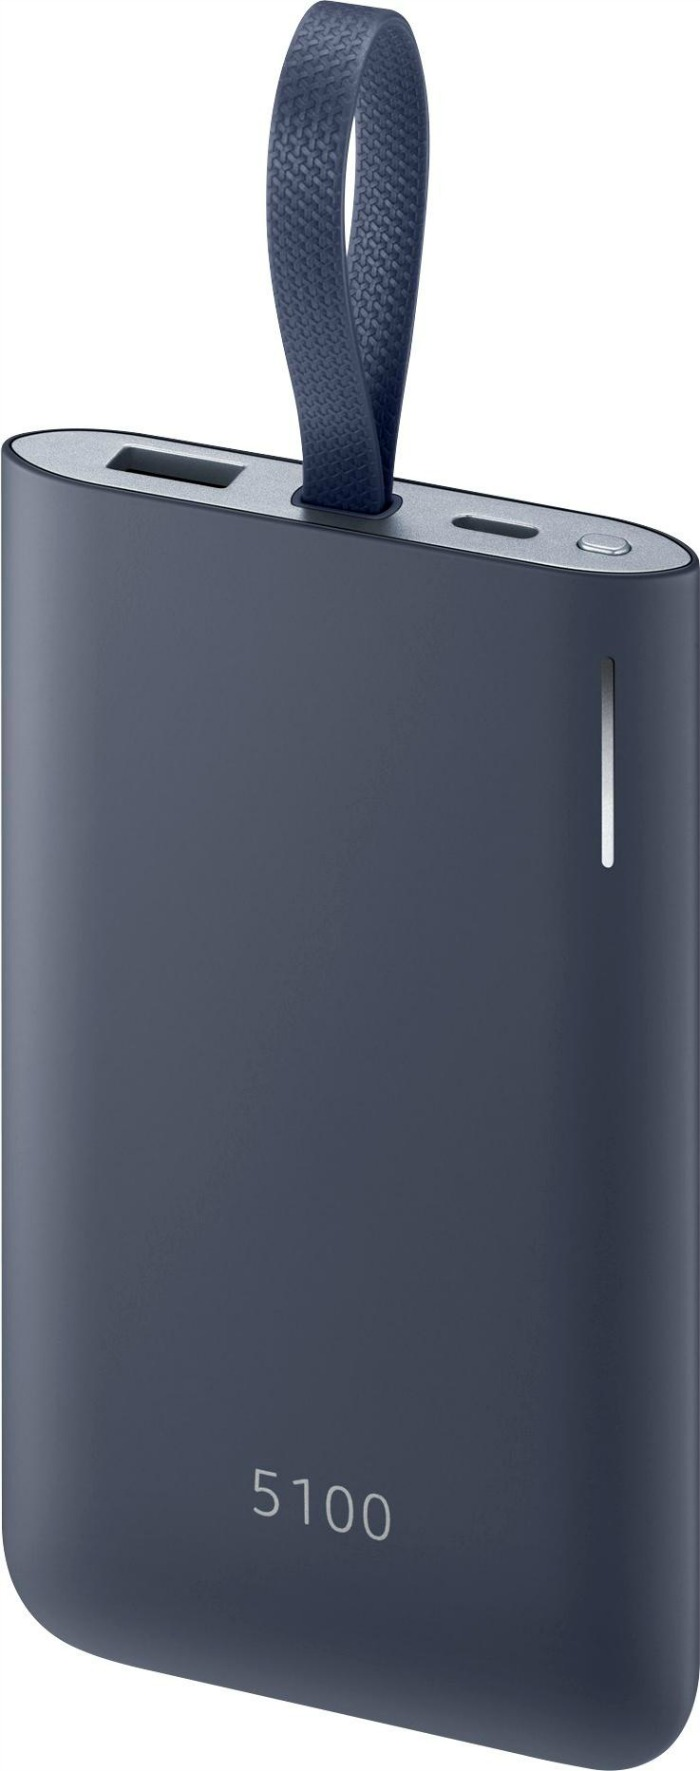 Samsung portable battery